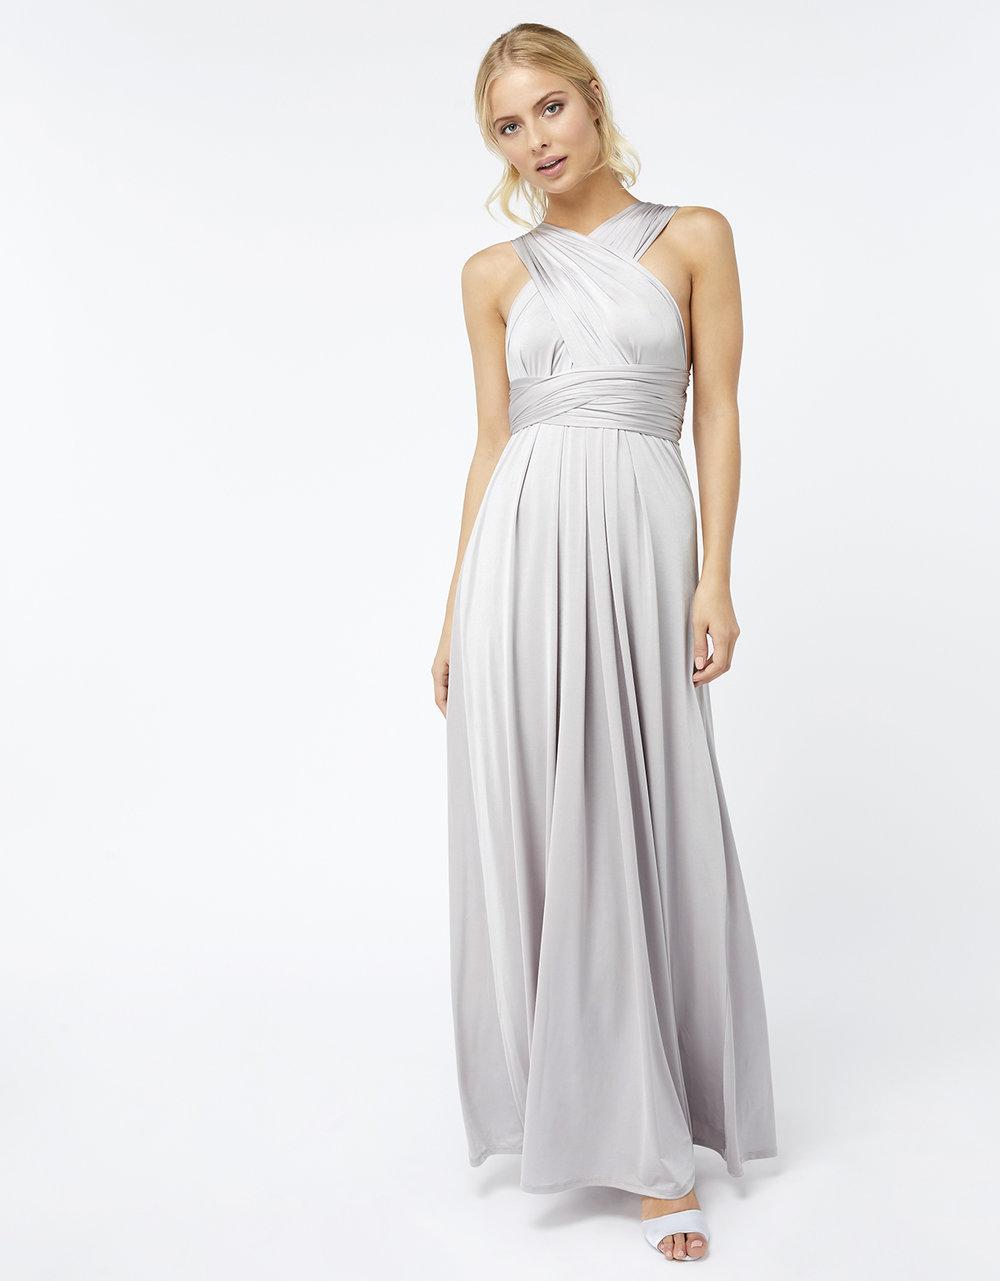 Silver Bridesmaid Dress Autumn 2018 Fashion Trends